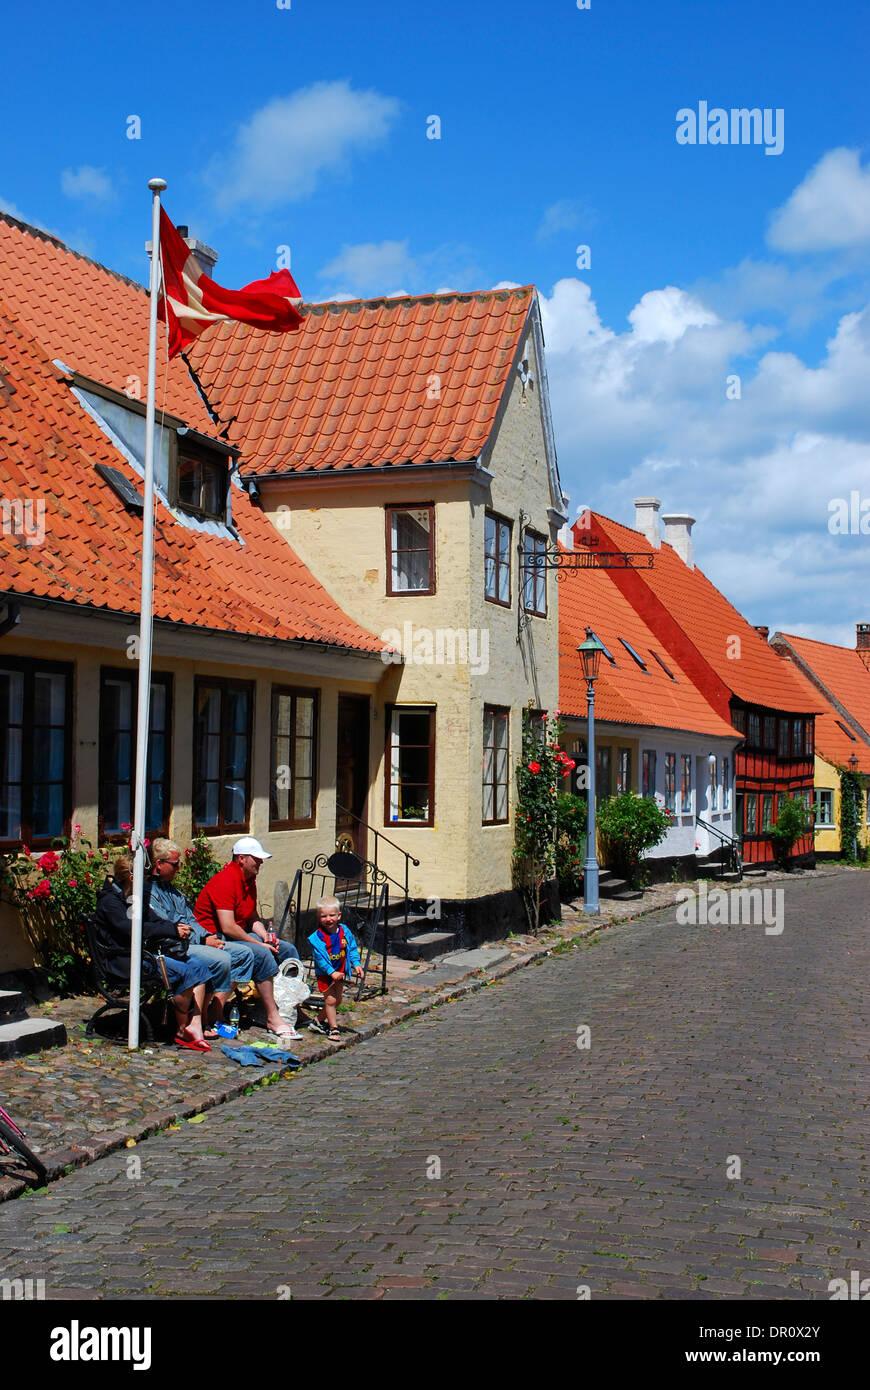 Aero island,  houses at Bodegade, Aeroskobing, fyn, Denmark, Scandinavia, Europe Stock Photo